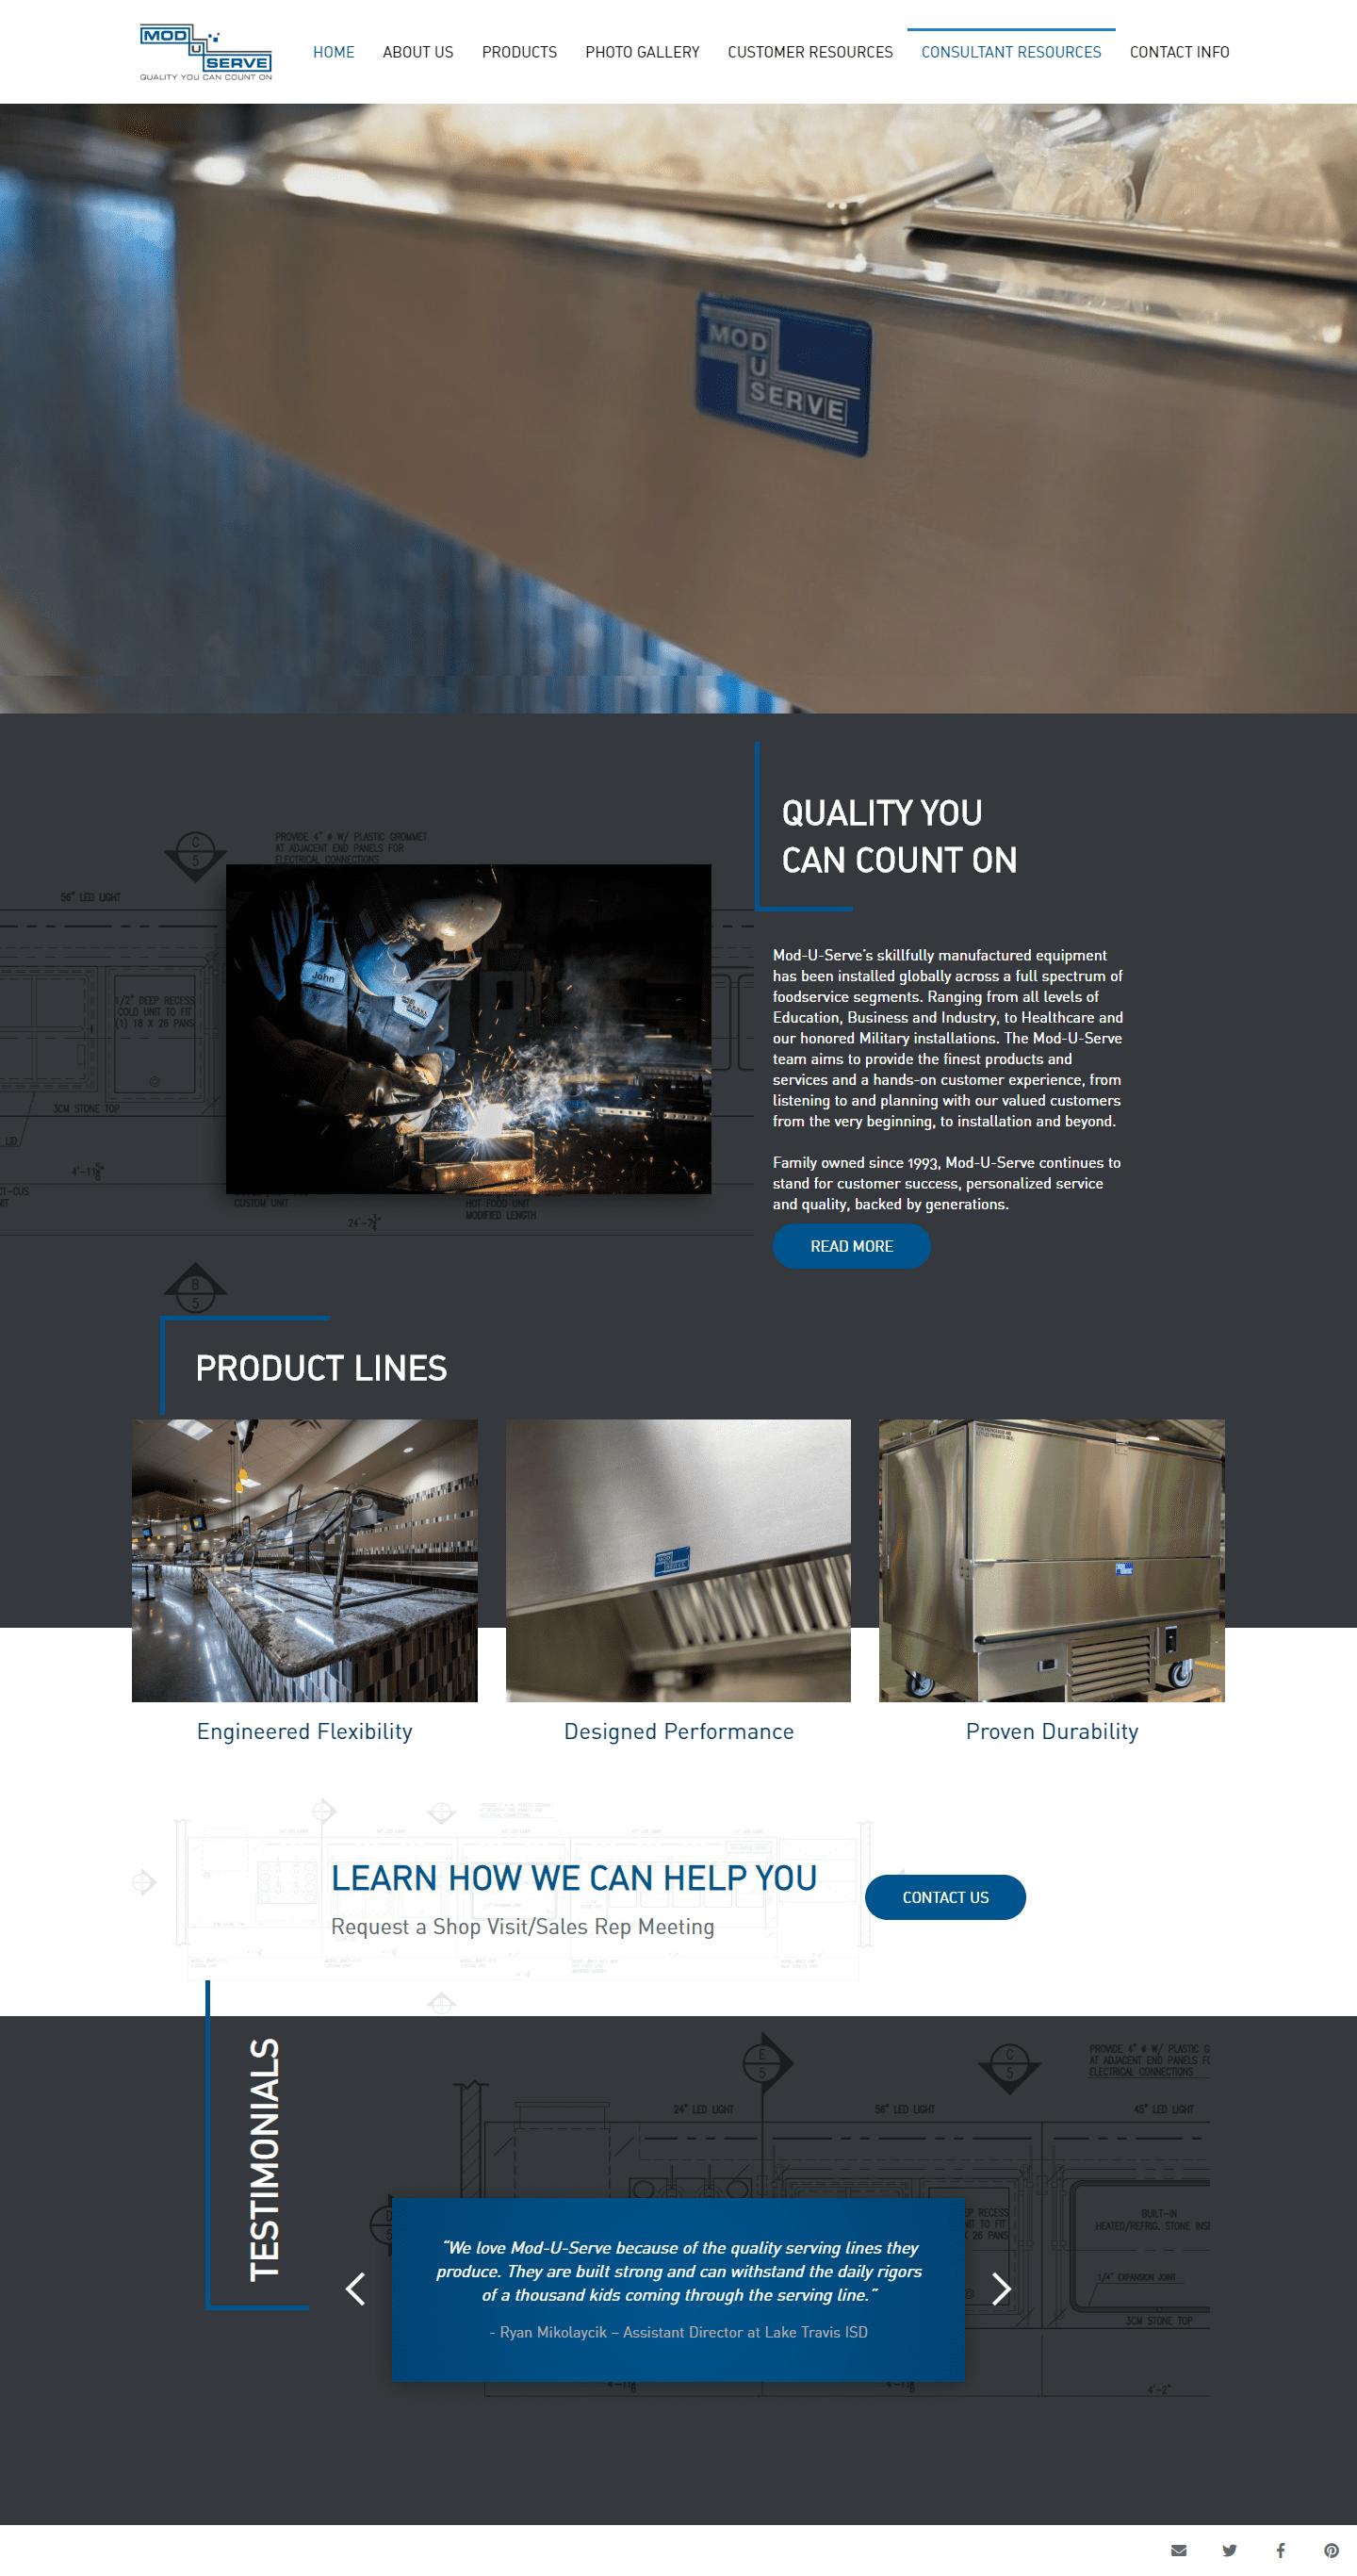 Mod-U-Serve The Woodlands Web Design Page